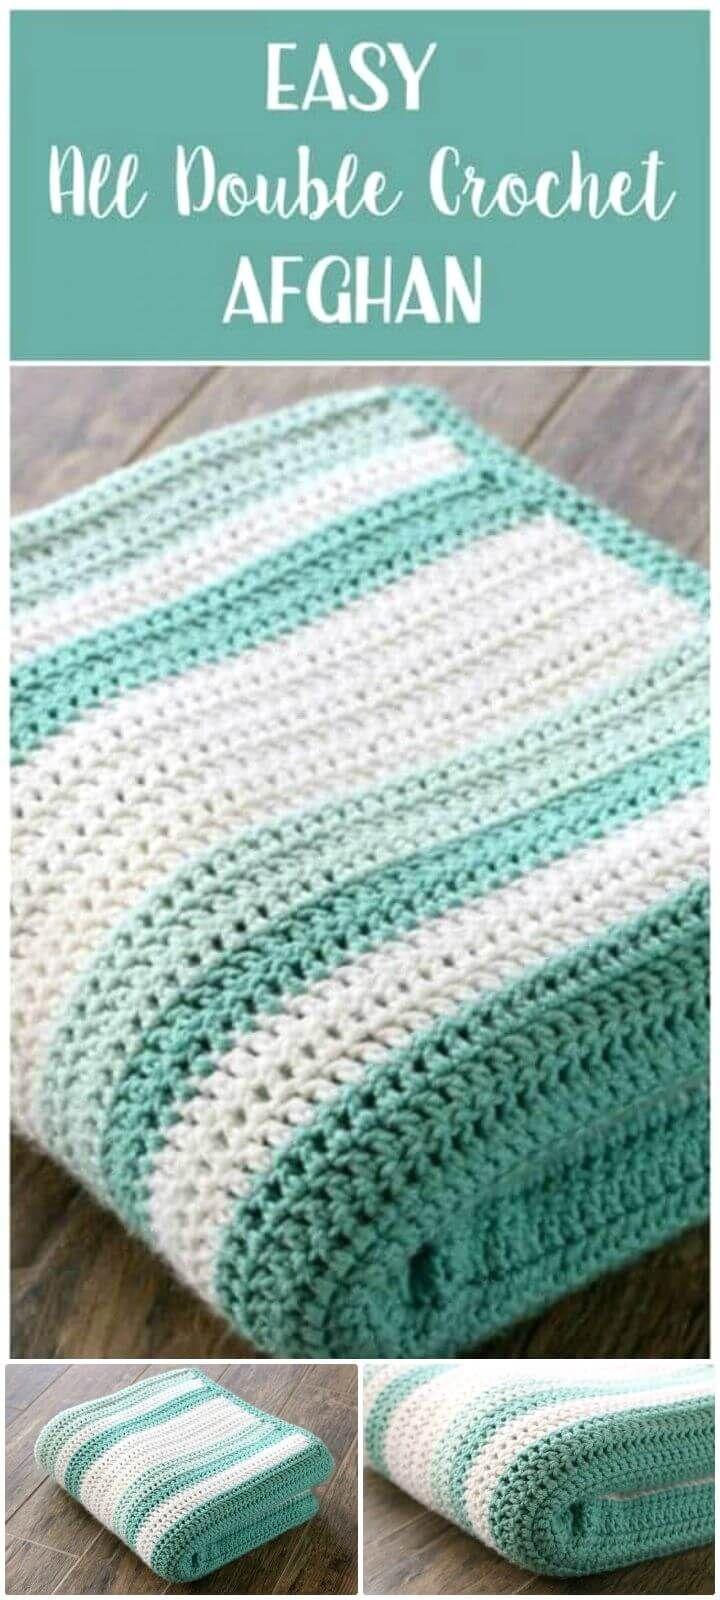 Crochet Afghan Patterns - 41 Free Patterns for Beginners   Bordes de ...